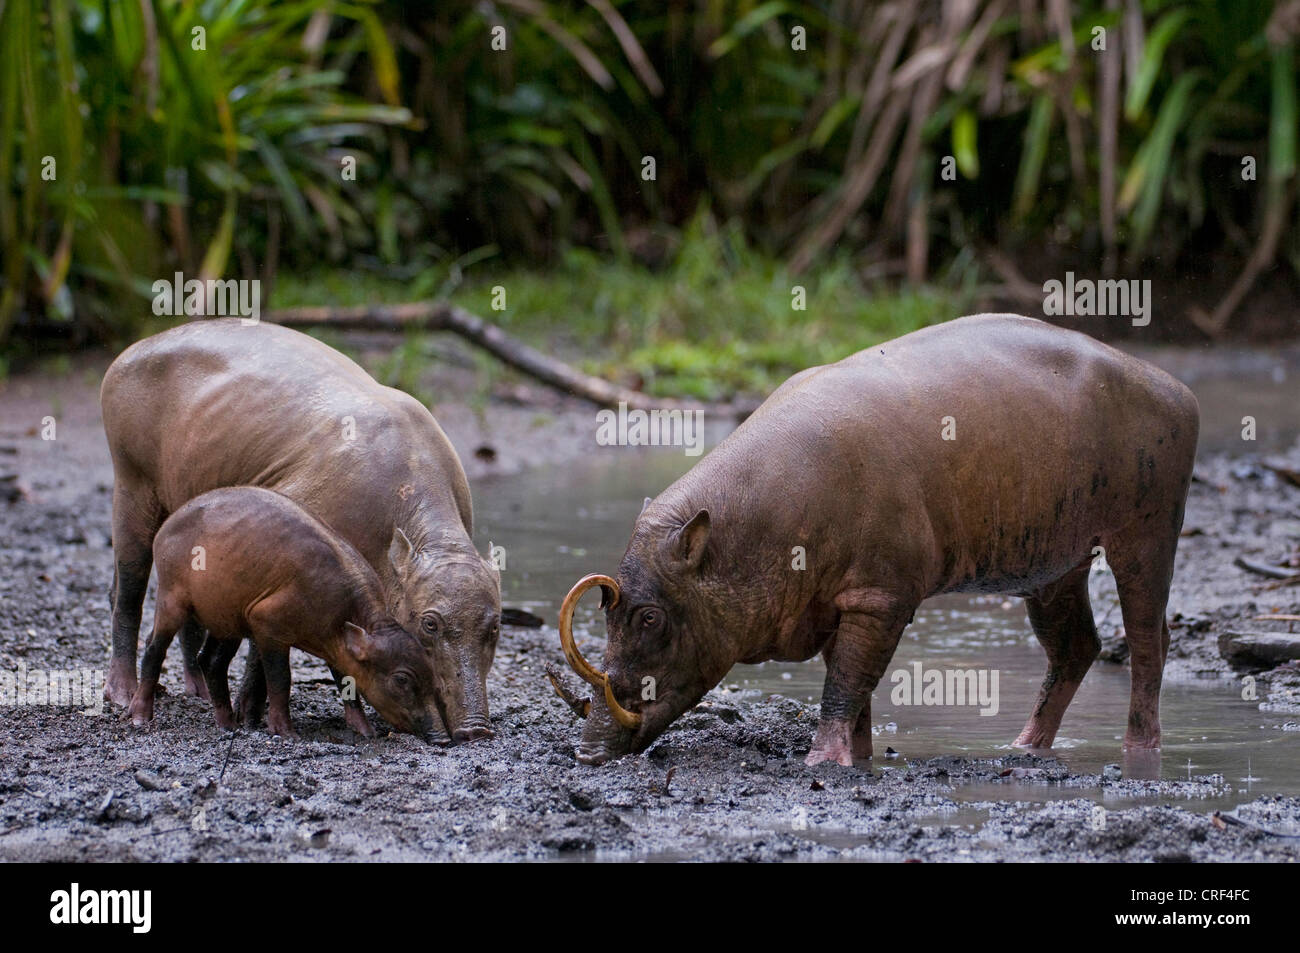 babirusa (Babyrousa babyrussa celebensis, Babyrousa celebensis), family on the feed, Indonesia, Sulawesi - Stock Image